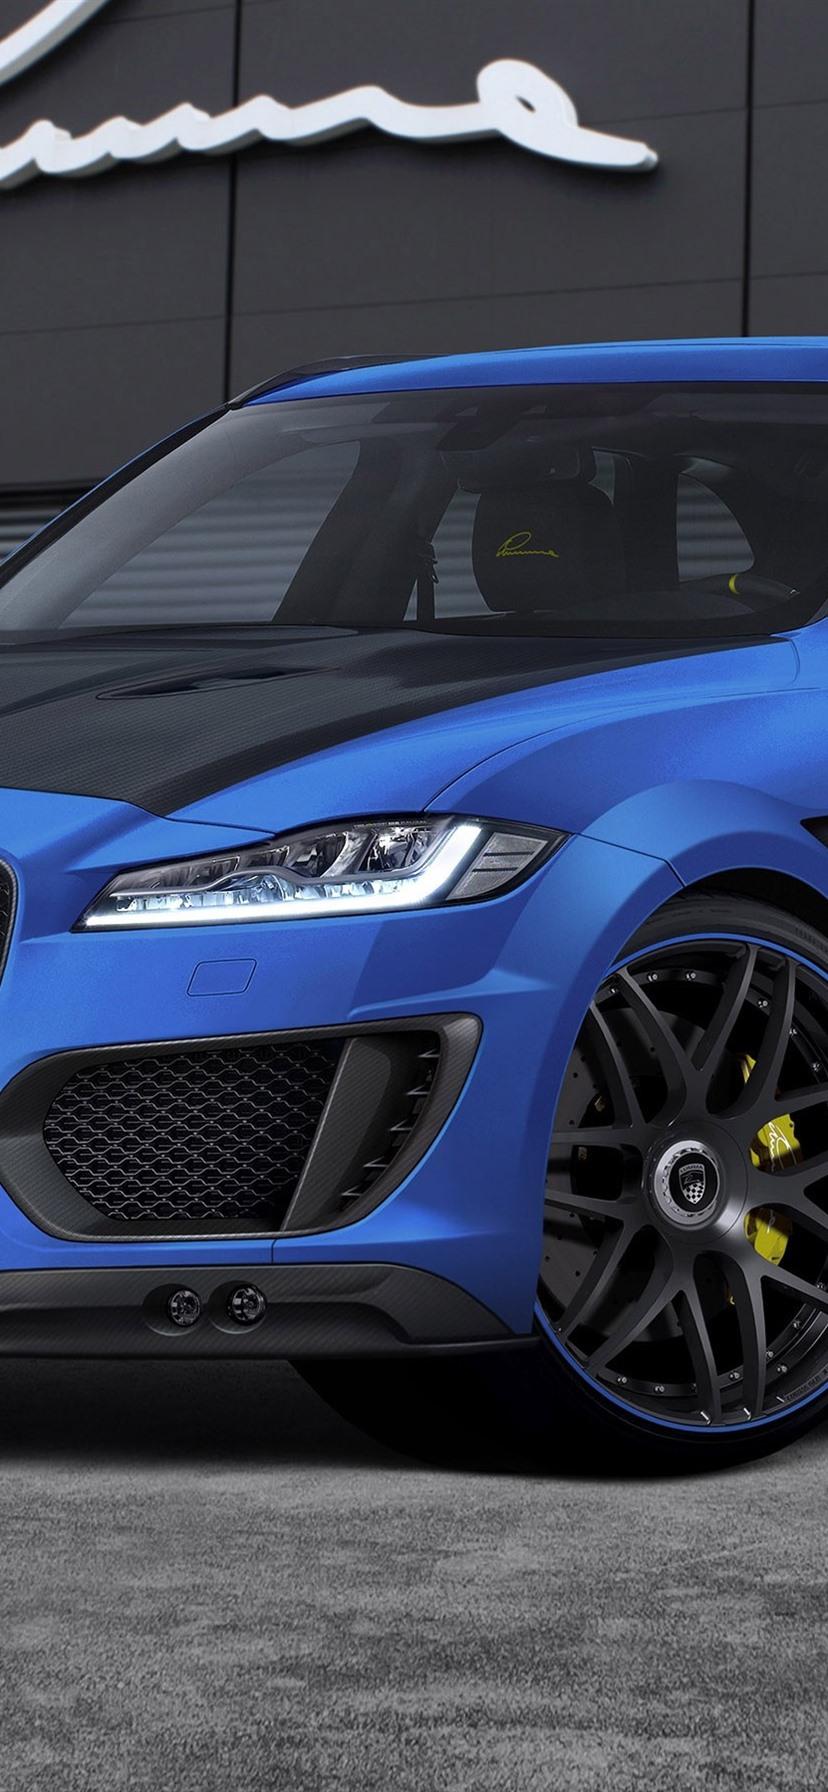 Jaguar F Pace Clr F Blue Car 828x1792 Iphone Xr Wallpaper